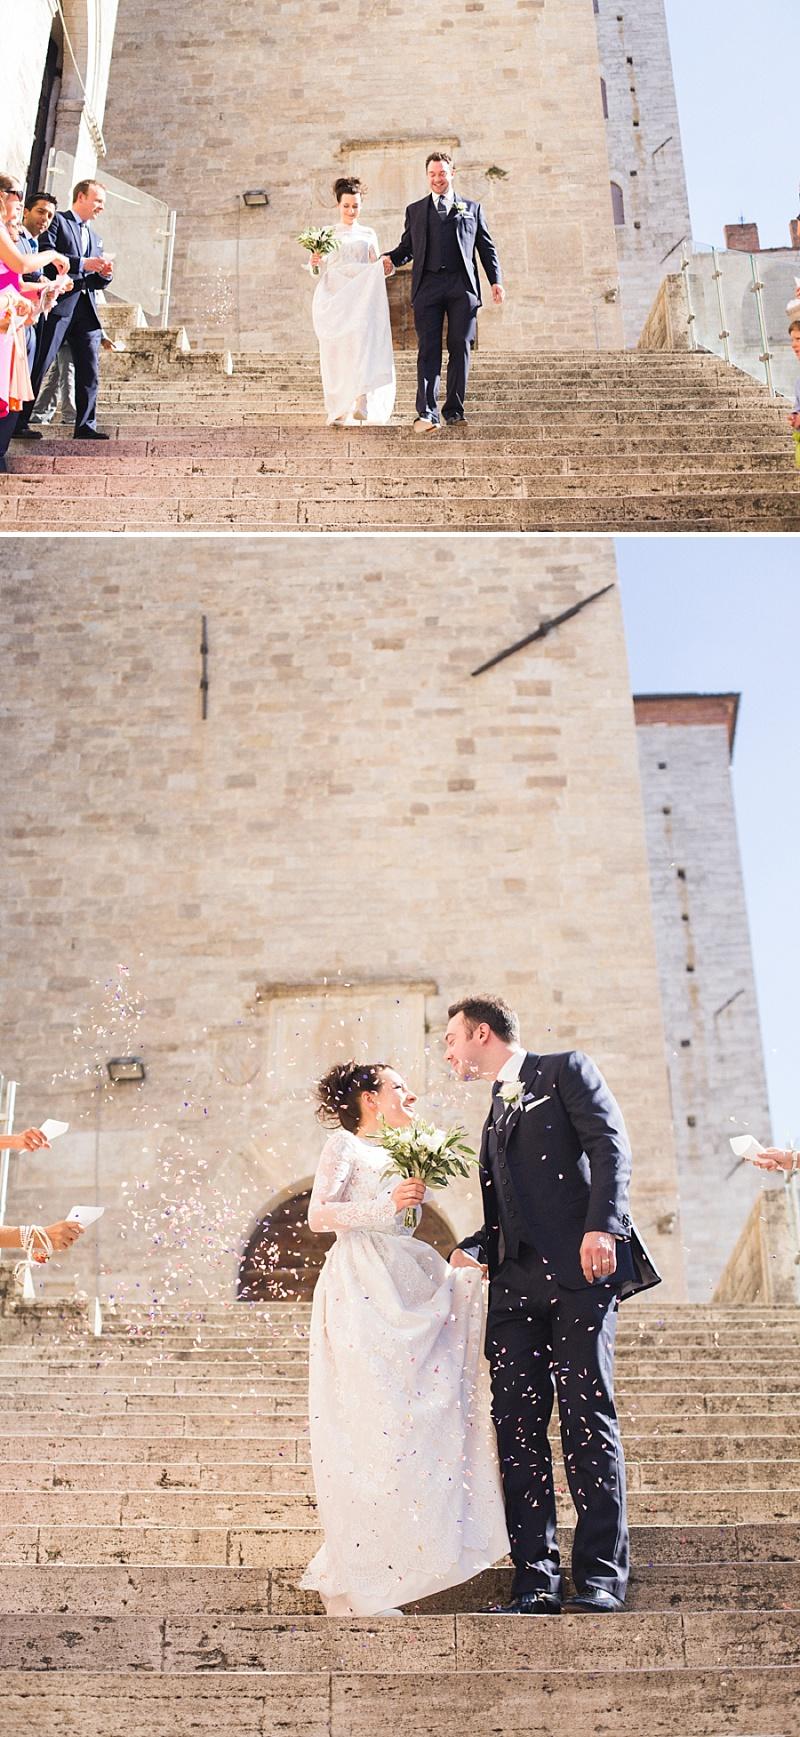 A Italian Destination Wedding In Tuscany with a Katya Katya Shehurina dress._0006